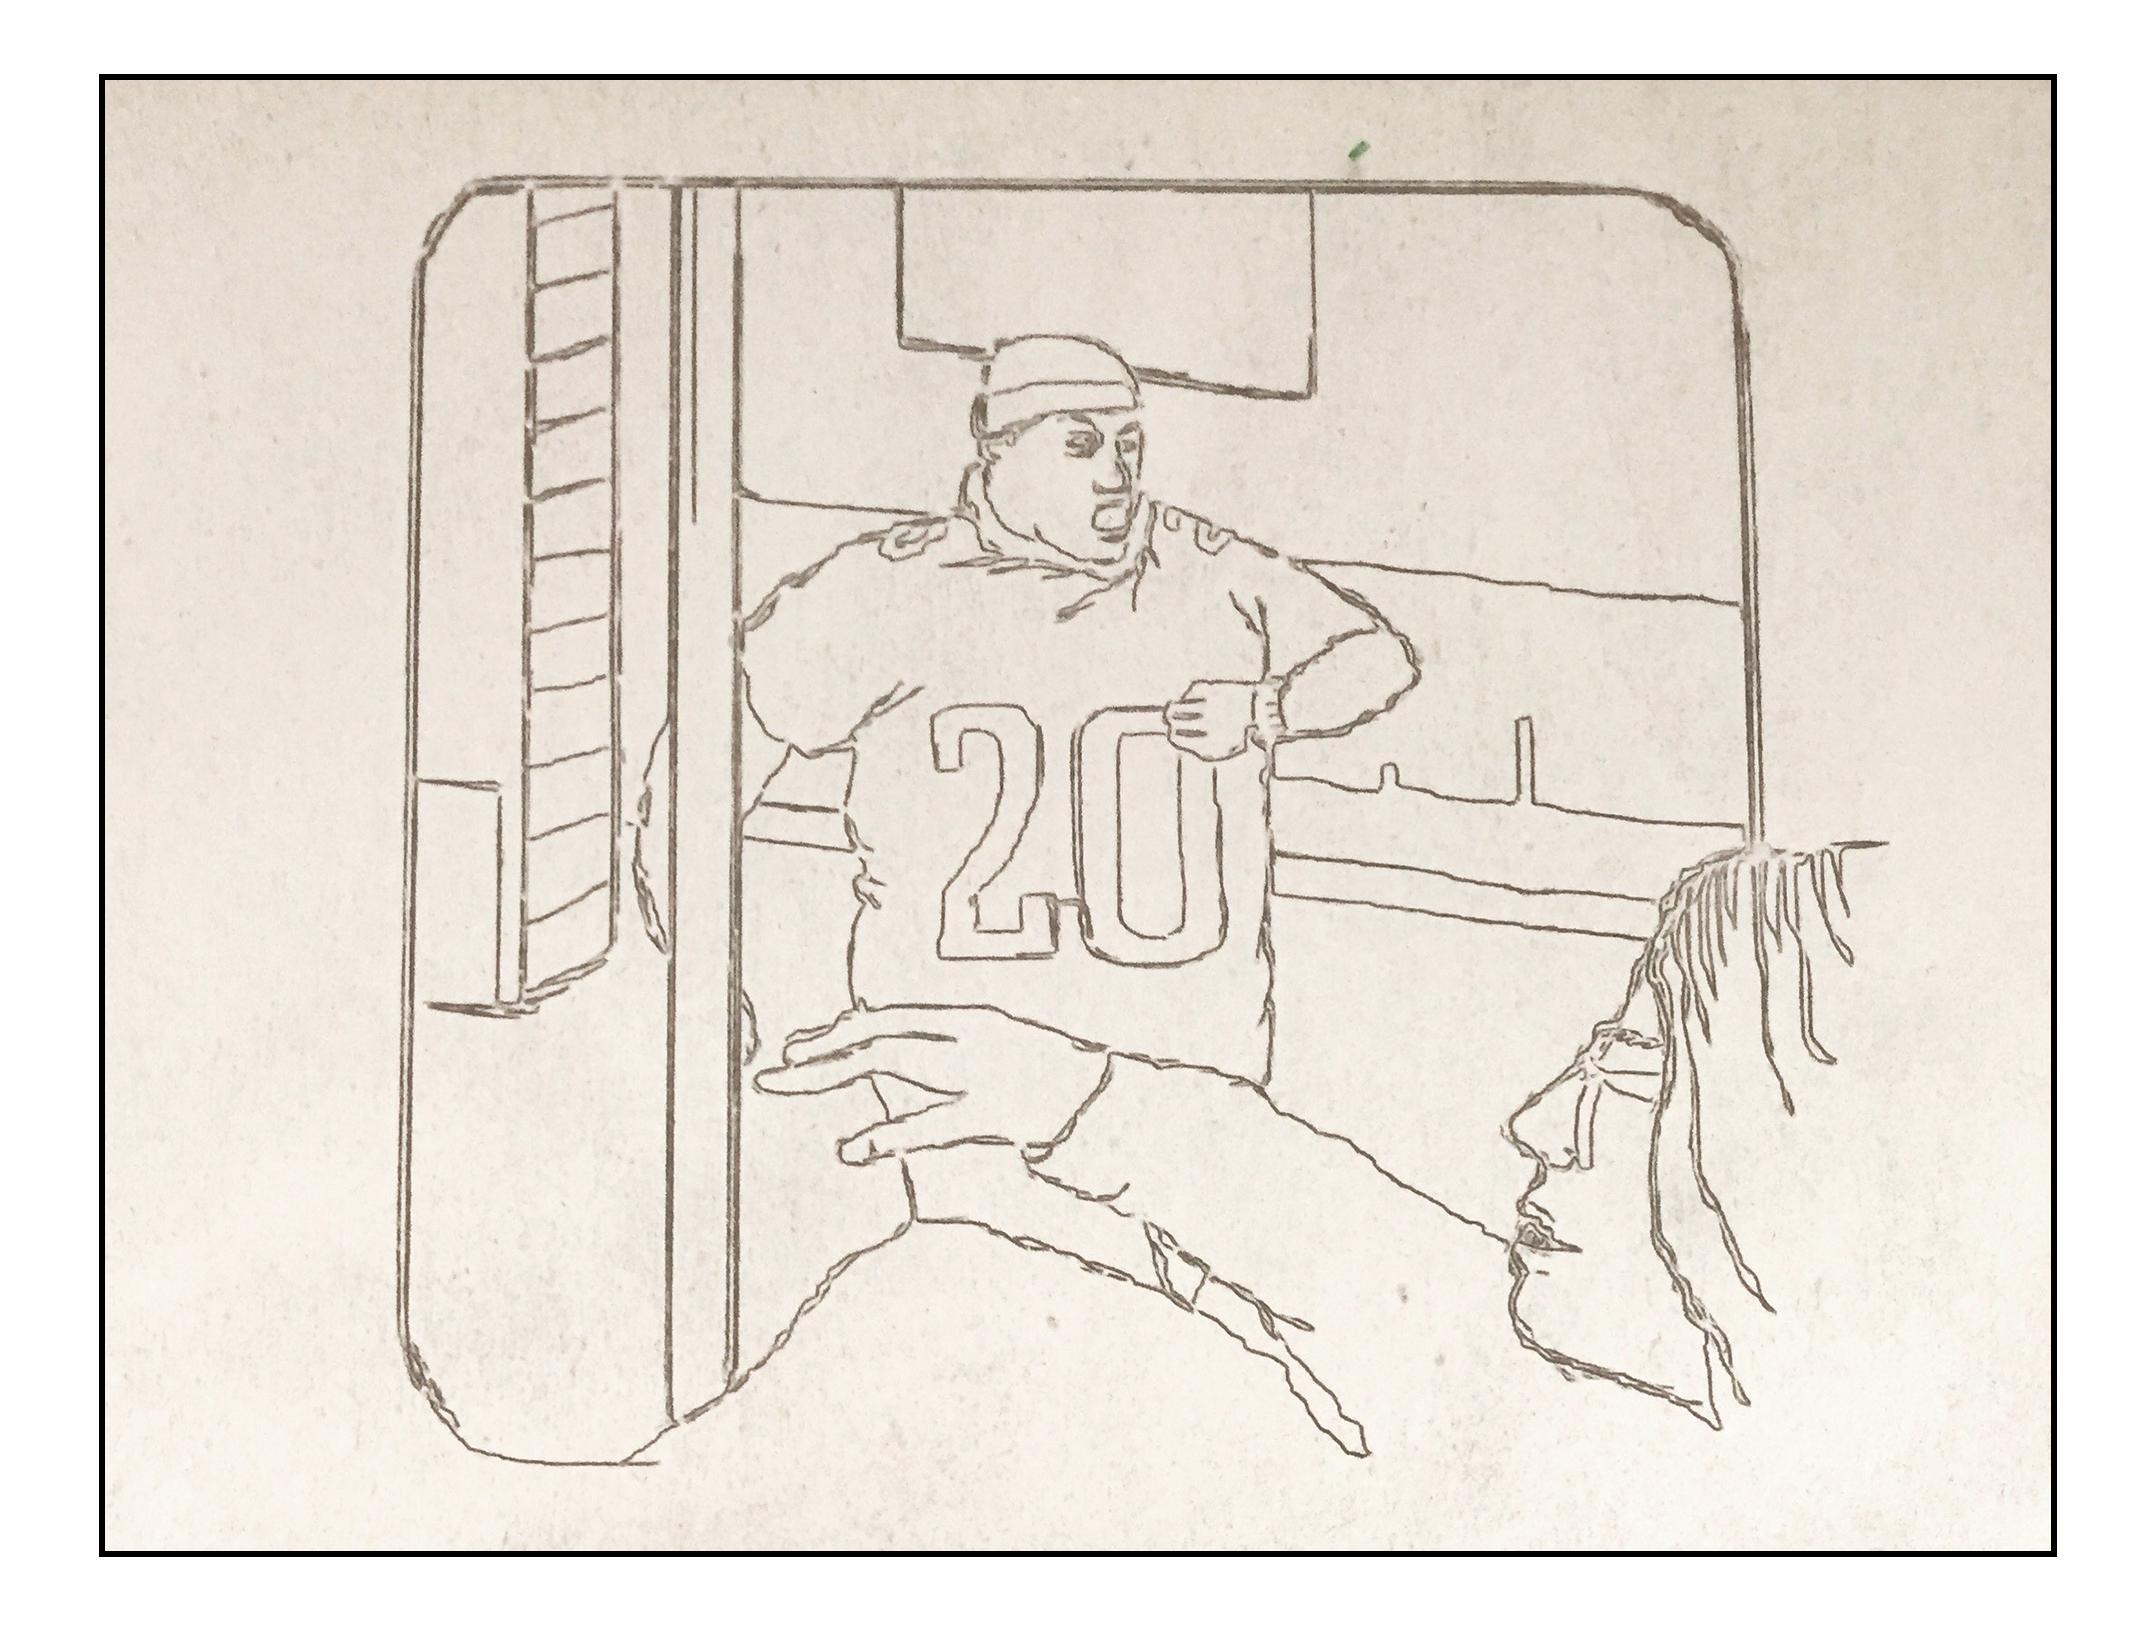 Etch A Sketch Super Bowl Lii Preview For Philadelphia Eagles New England Patriots Mina Kimes 2018 Nfl